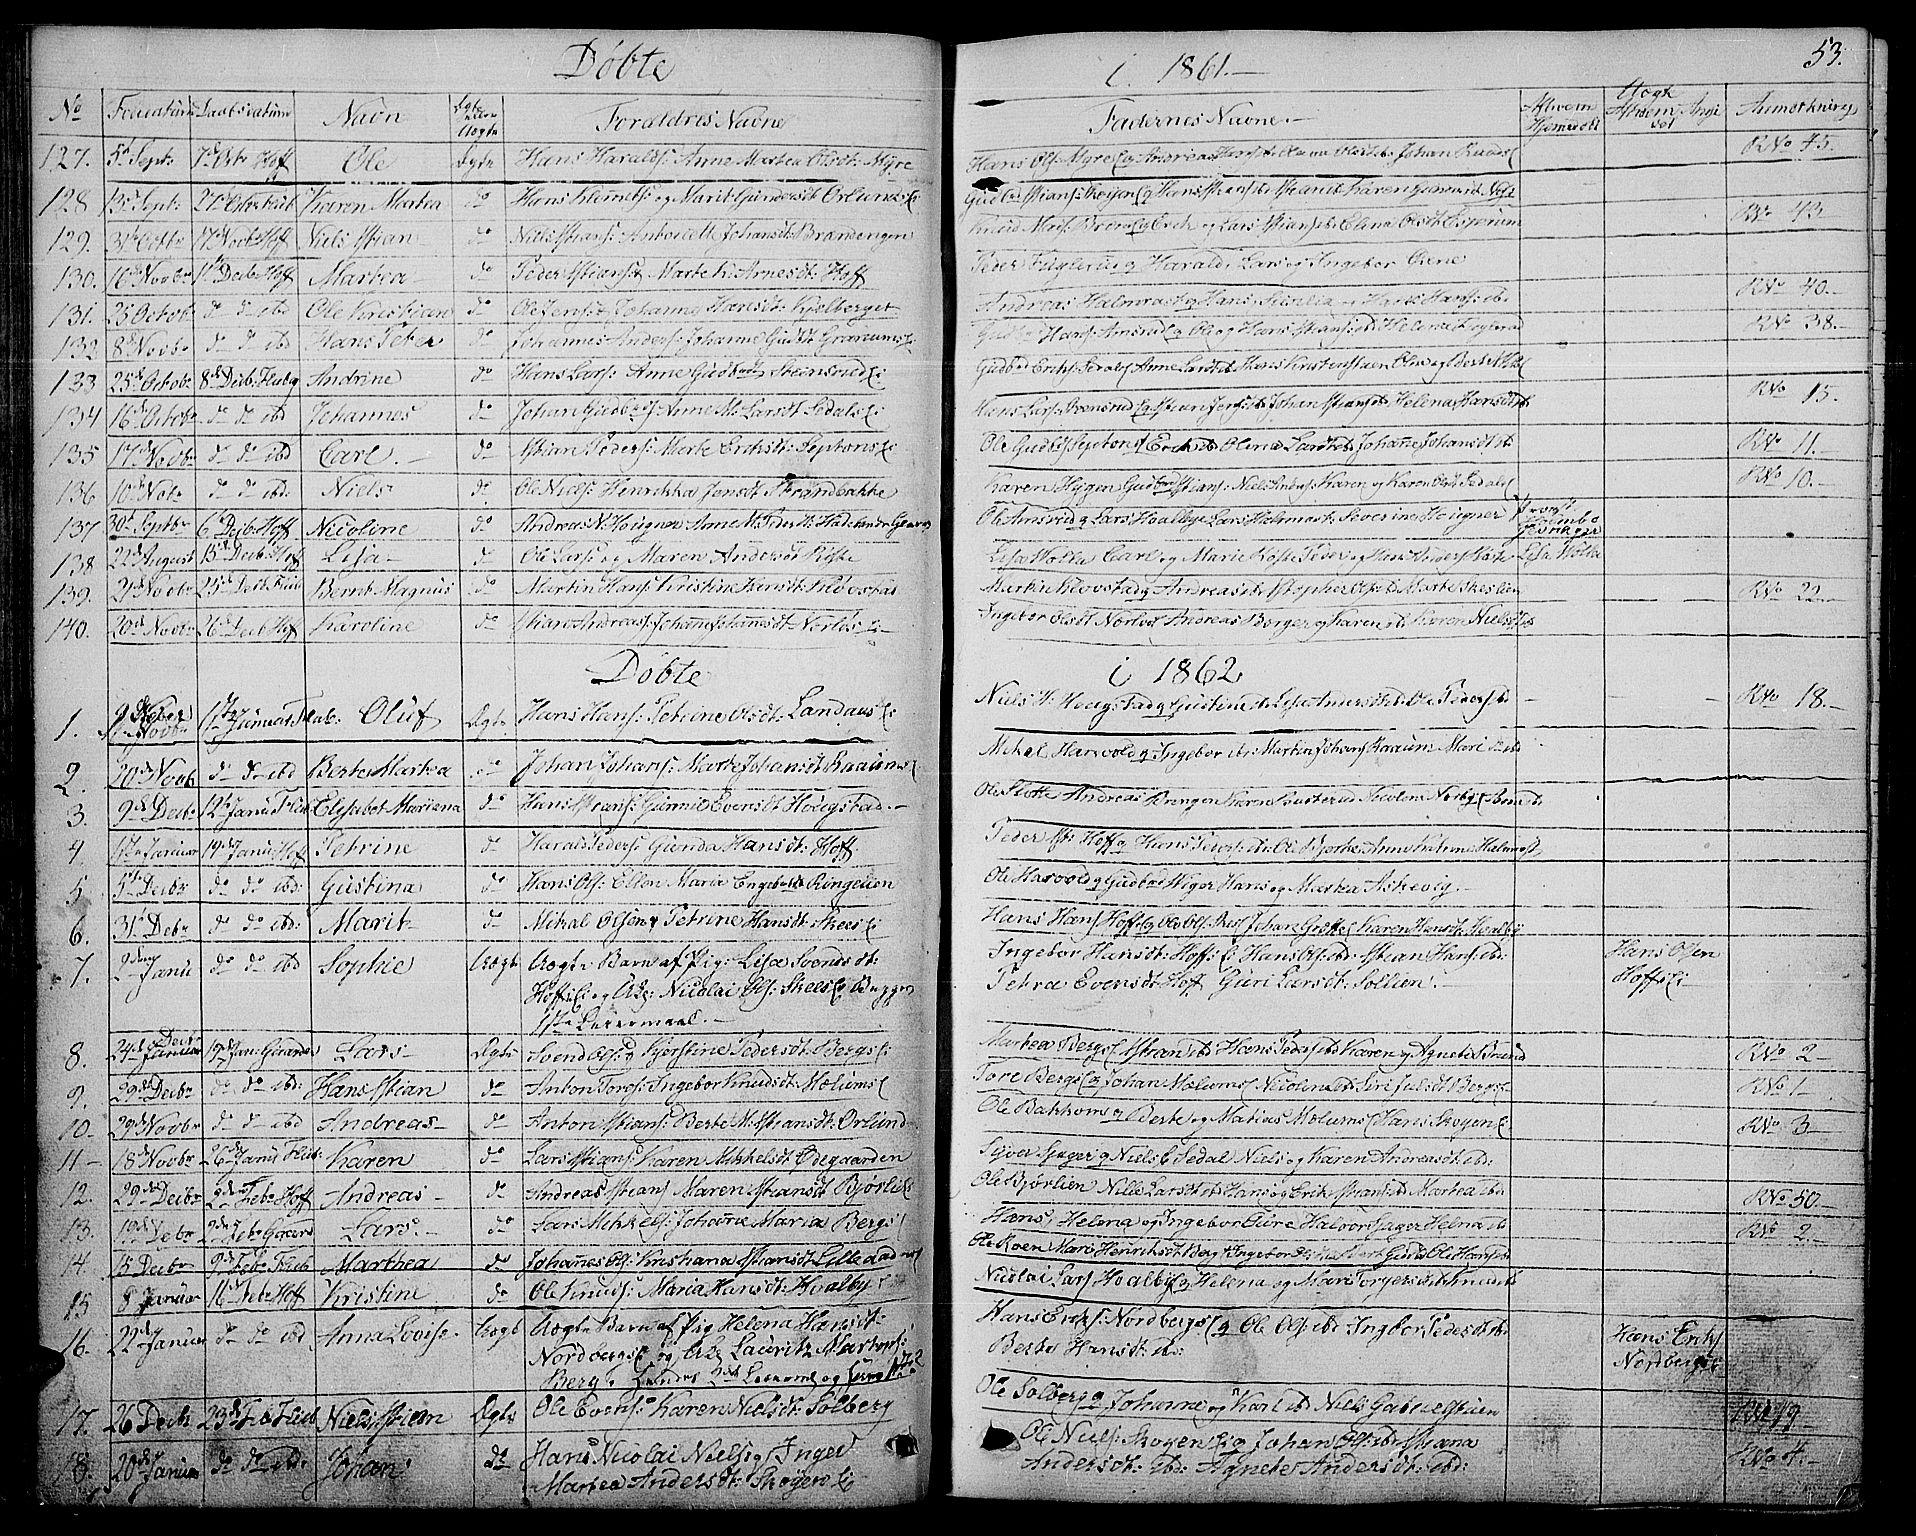 SAH, Søndre Land prestekontor, L/L0001: Klokkerbok nr. 1, 1849-1883, s. 53